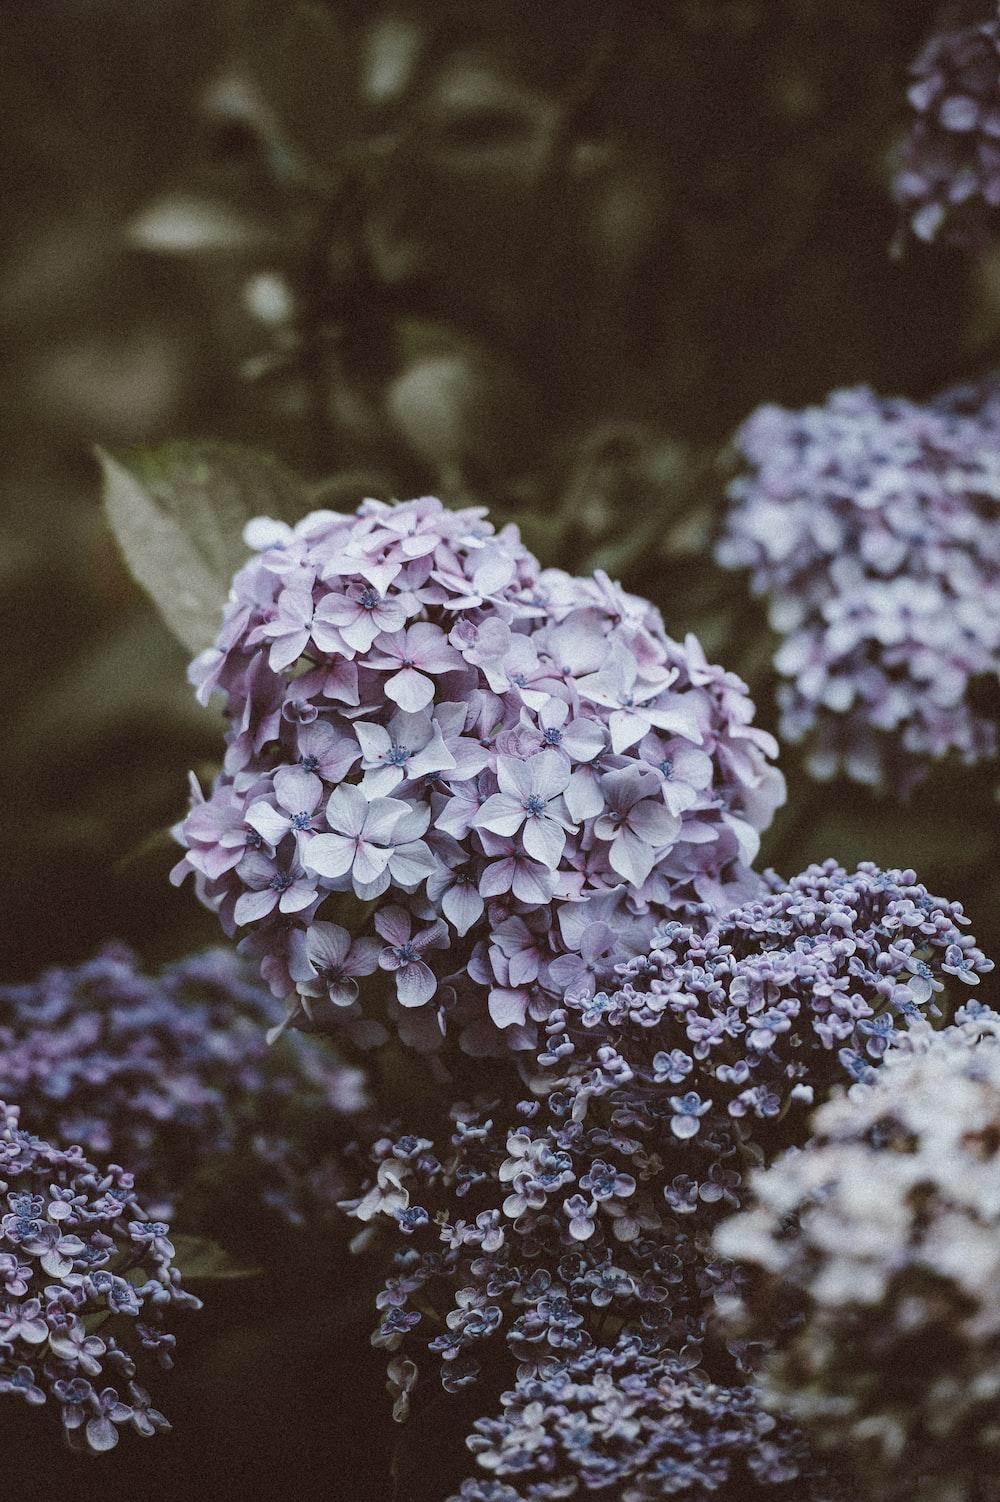 selective focus photography of purple hydrangeas flowers